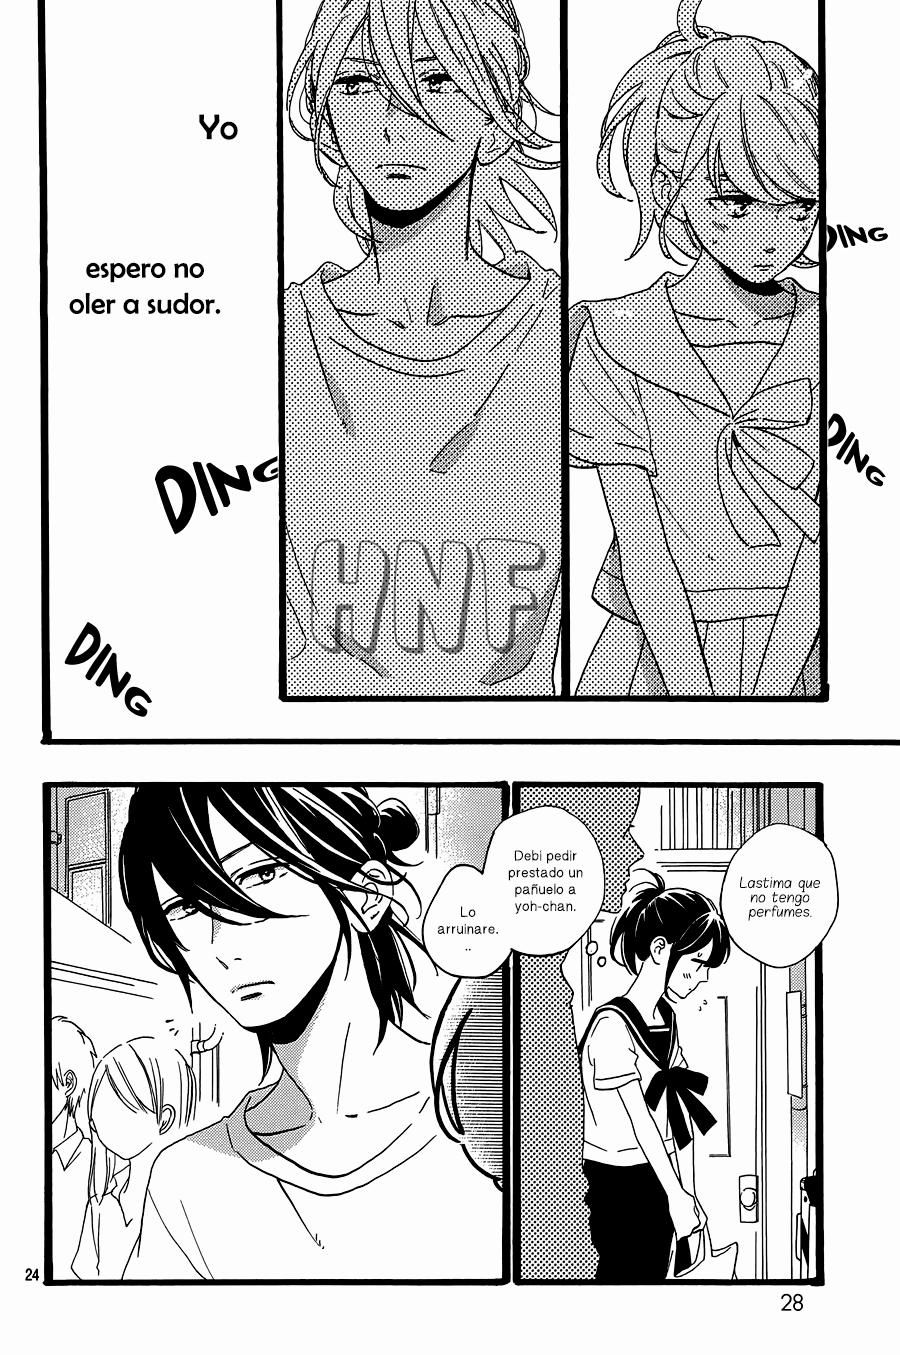 Manga Tsubaki Chou Lonely Planet Capítulo 10 Página 31